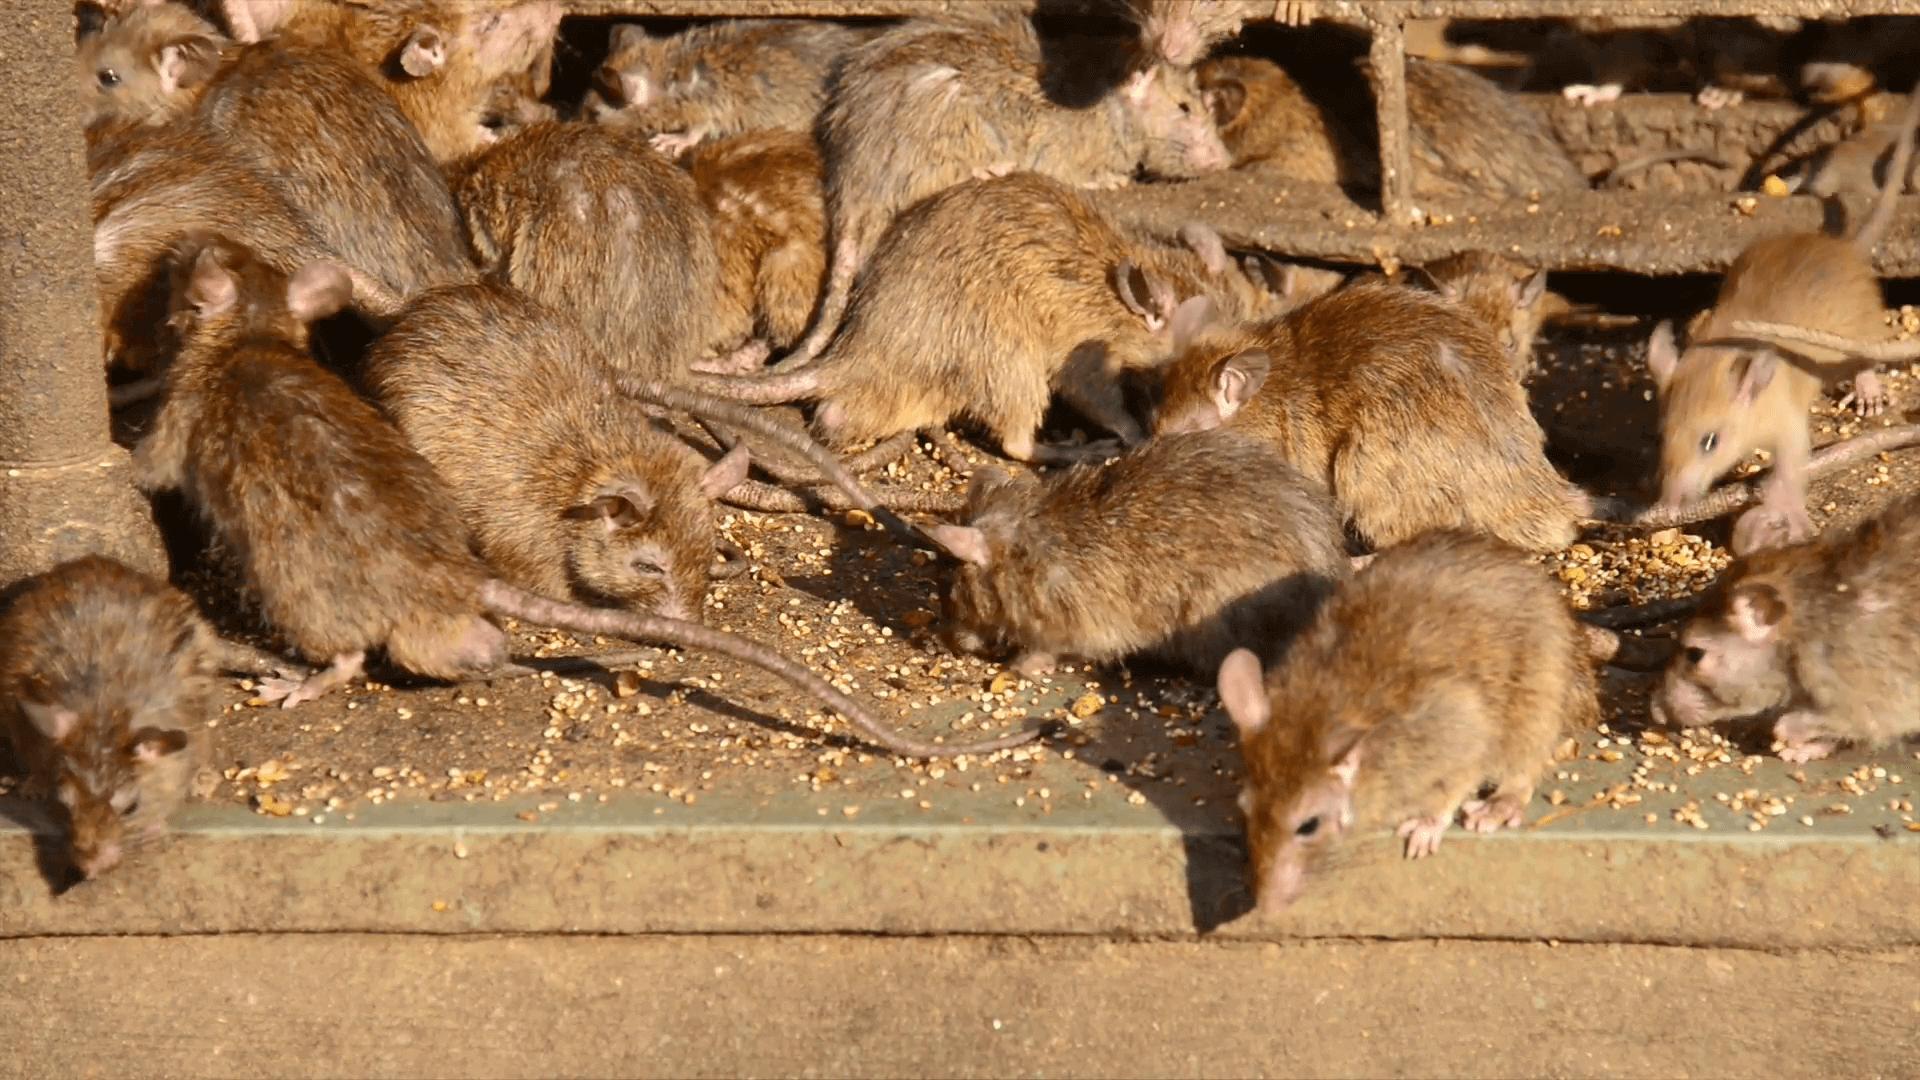 Capybara Reproduction Facts